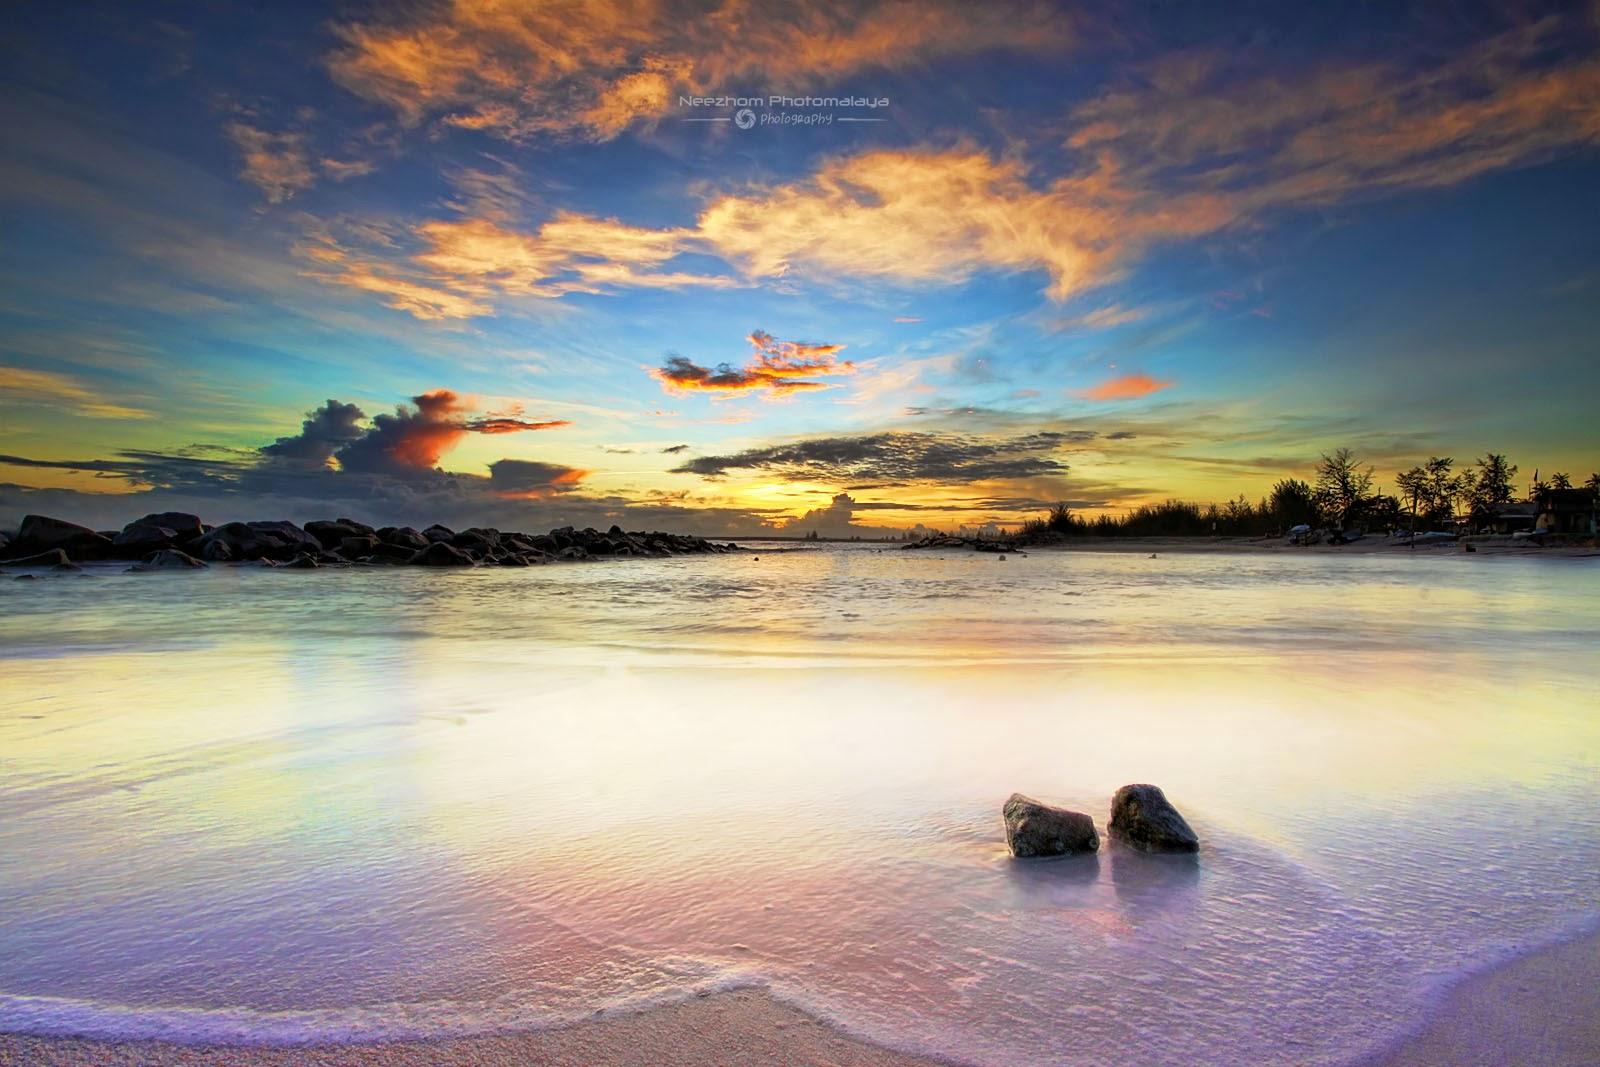 Sunrise Musim Tengkujuh 2014 di Pantai Tok Jembal